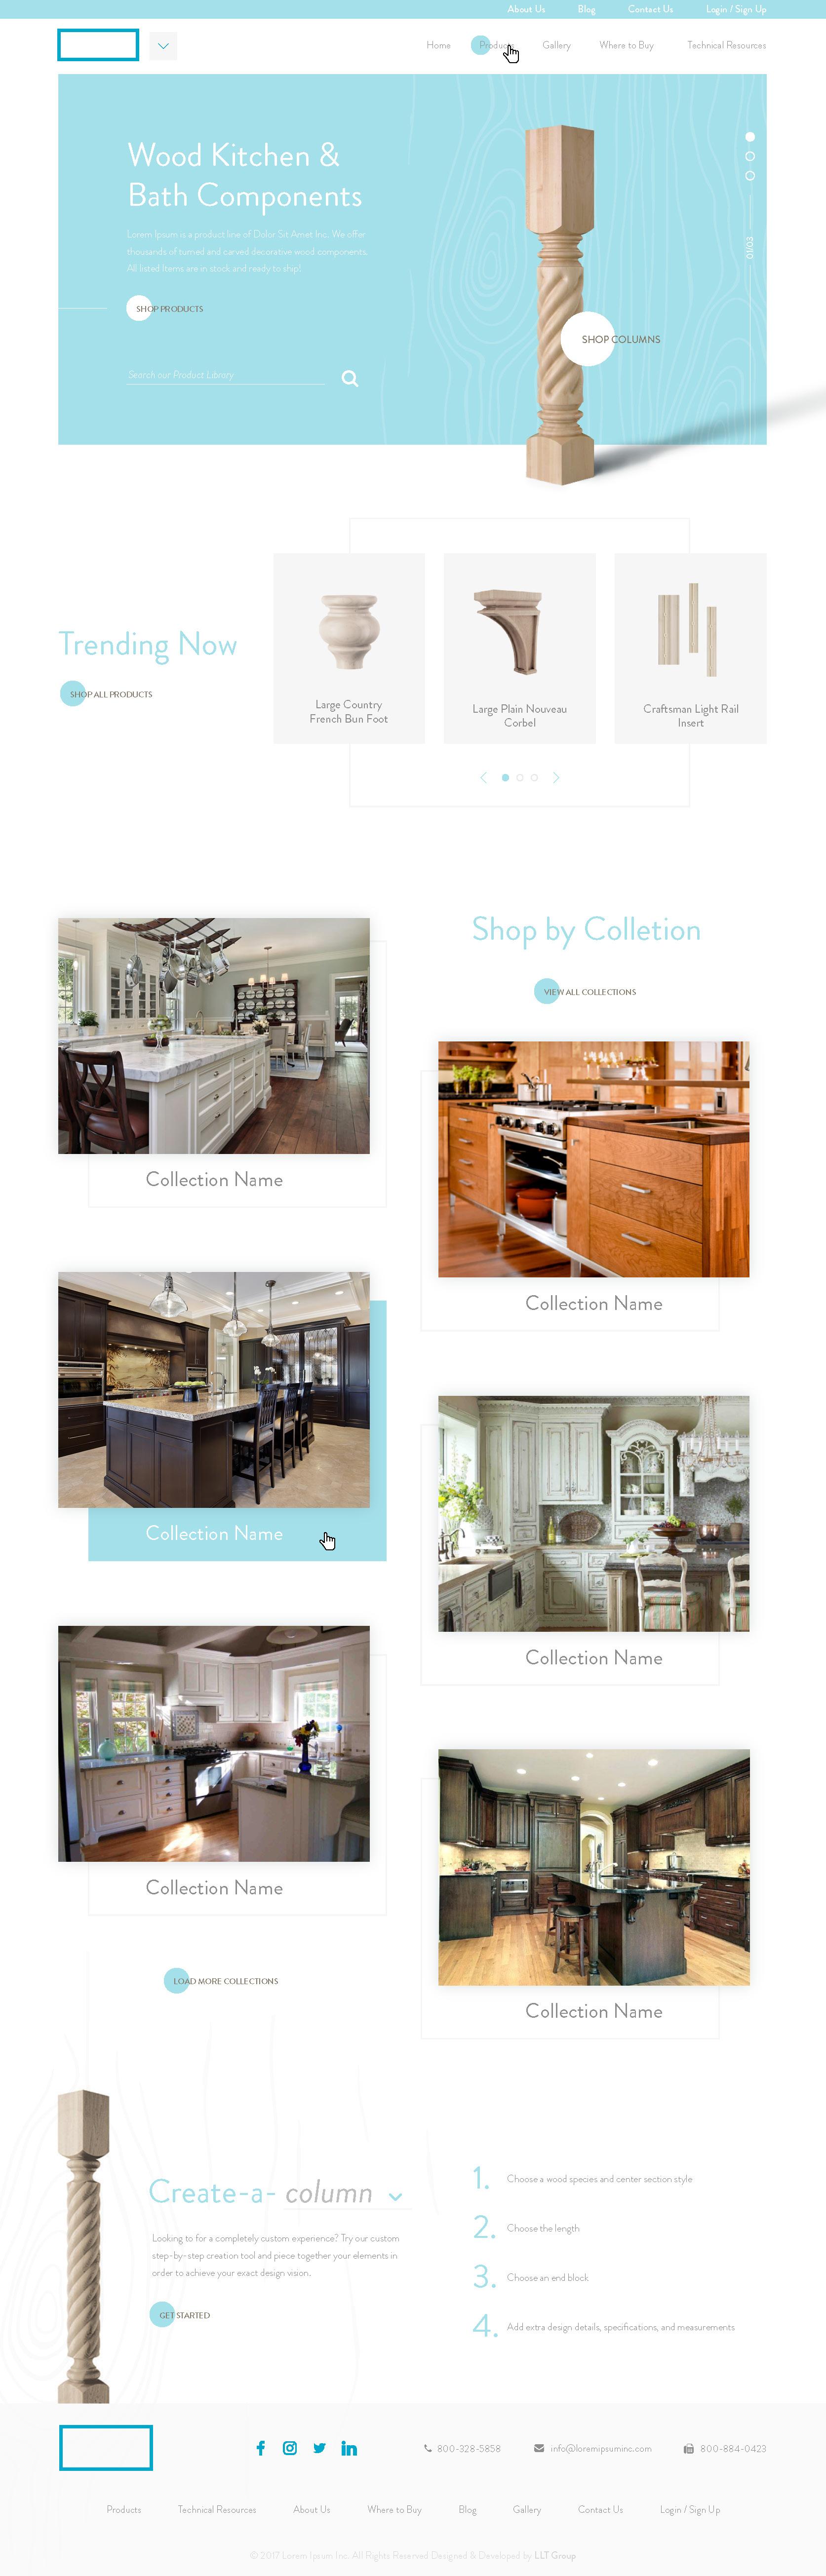 WoodCraft-Home-NoLogo_Page_2.jpg